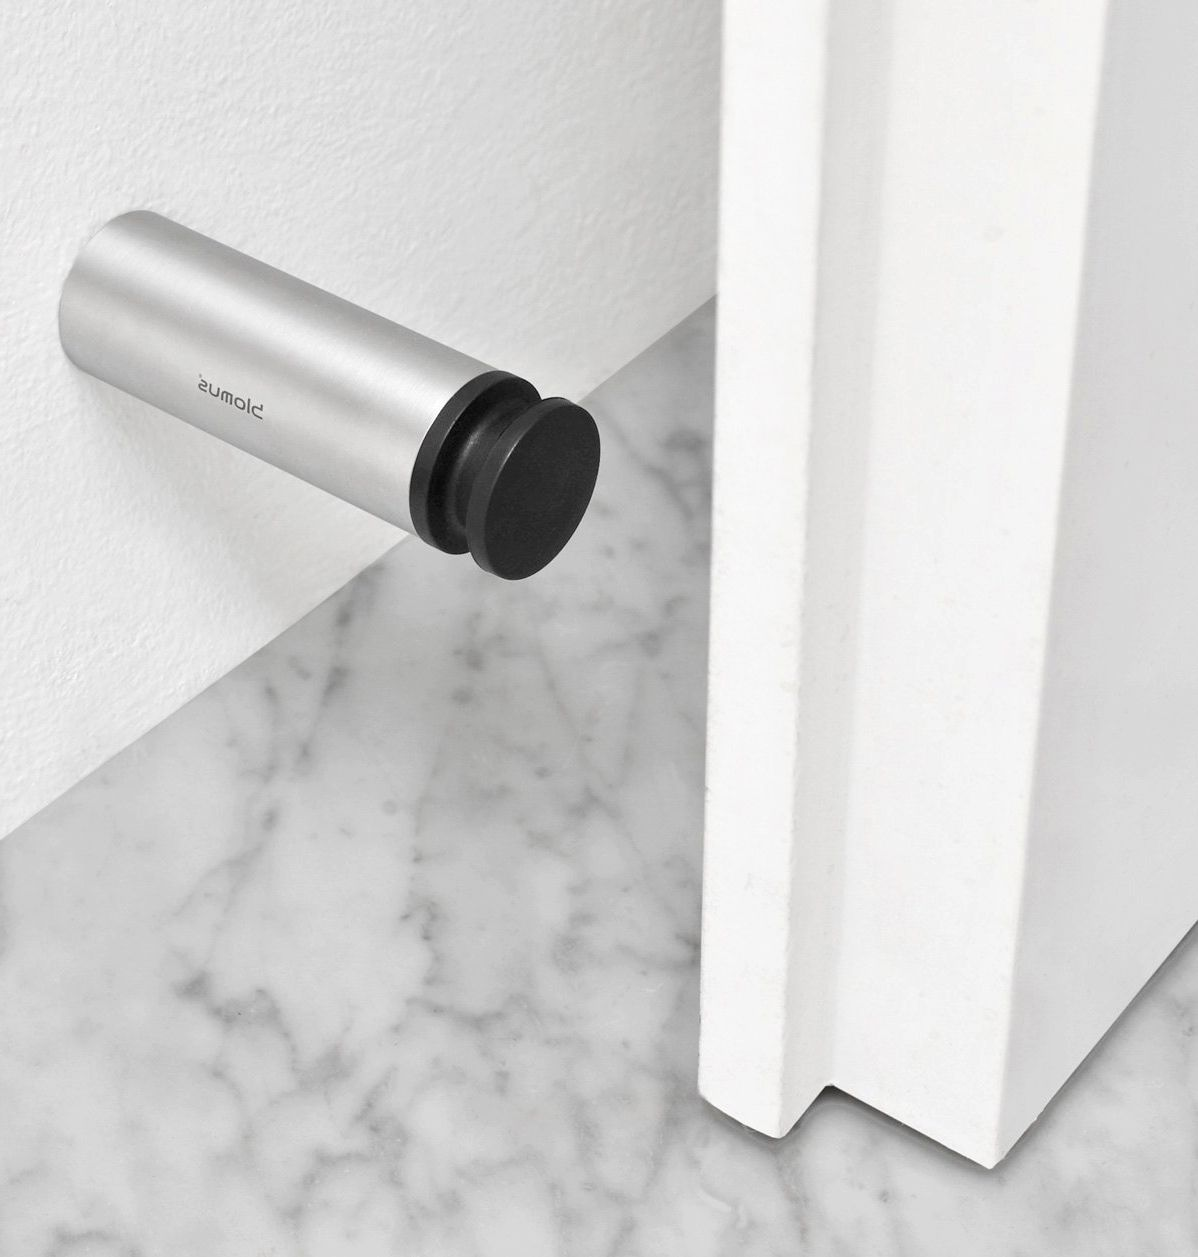 Metal Wall Holder Door Stoppers Or Holders Functions Types Installation Door Stopper Metal Walls Repair And Maintenance